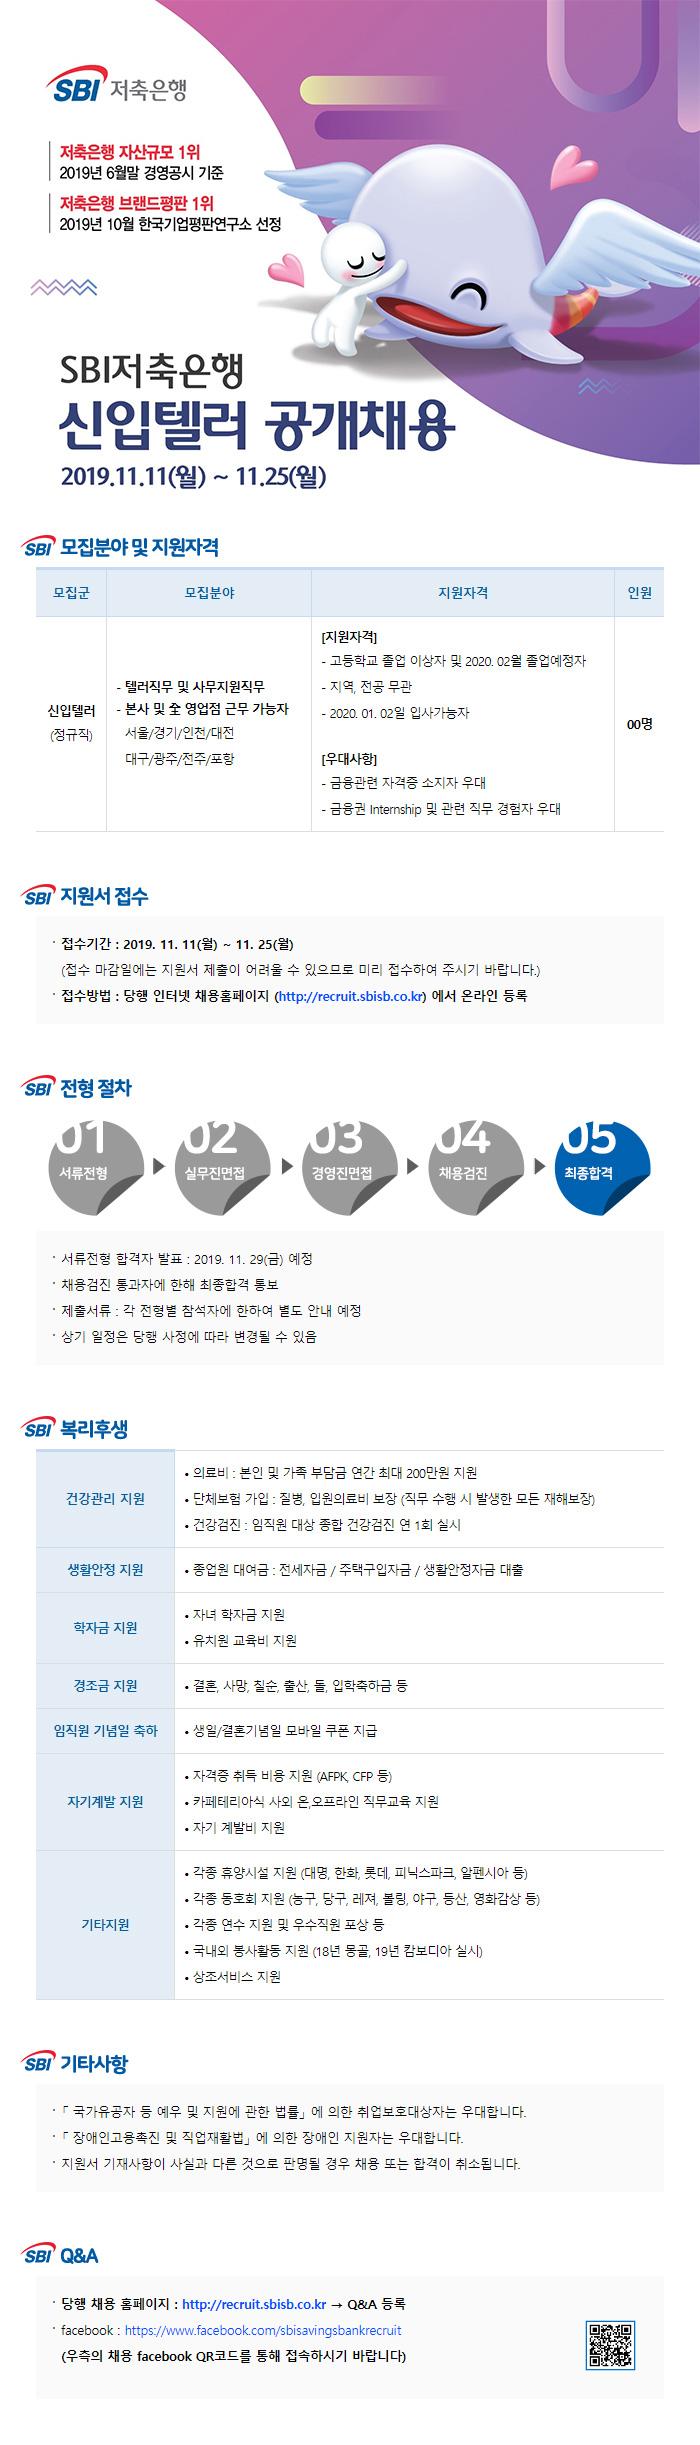 SBI저축은행 신입텔러 공개채용 [텔러직무 및 사무지원직무]